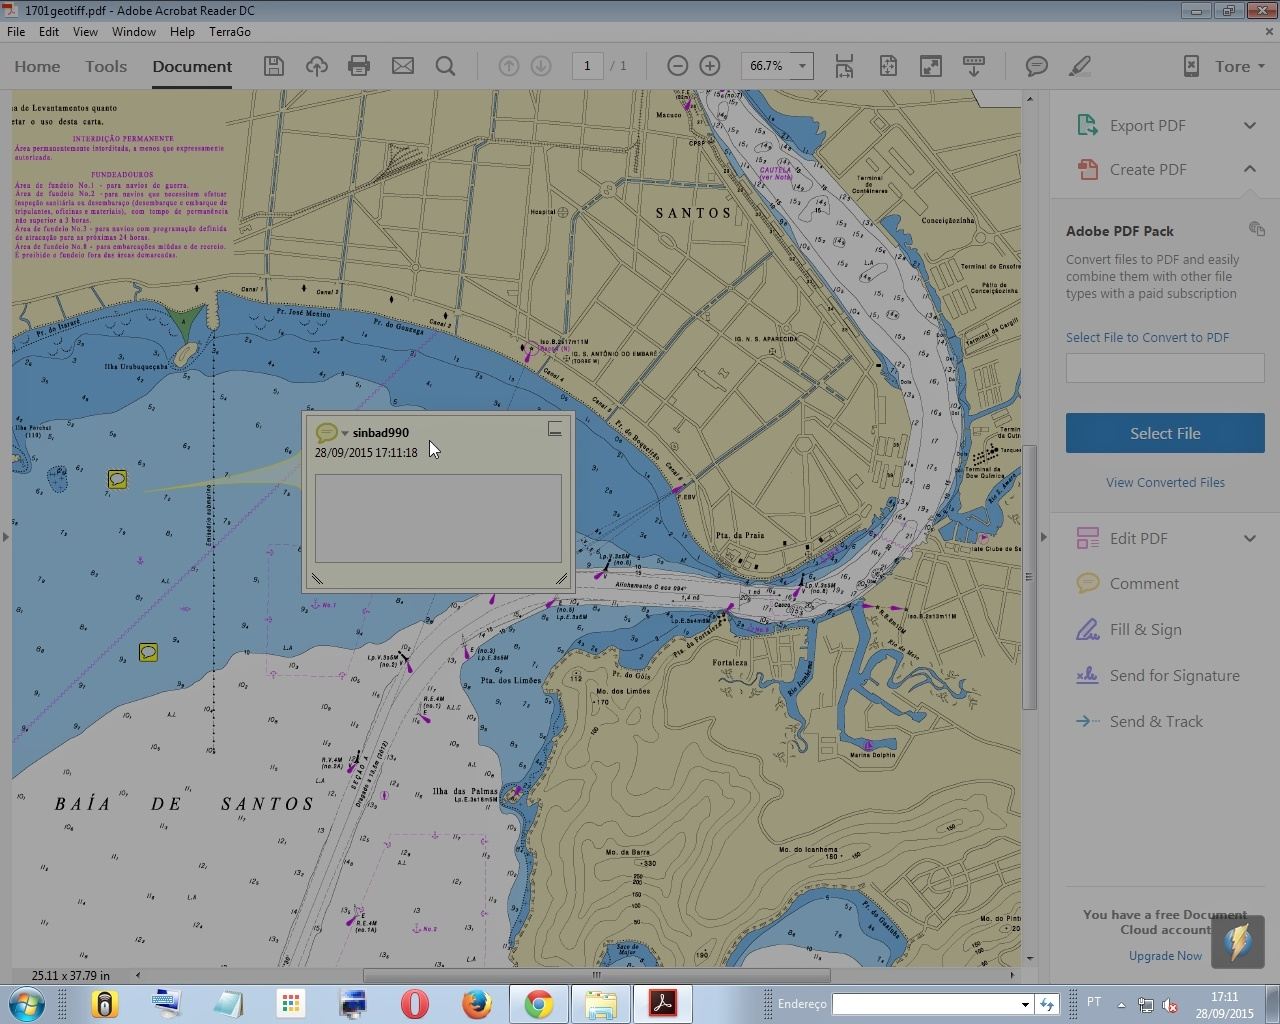 Click image for larger version  Name:1701geotiff.pdf - Adobe Acrobat Reader DC 2015-09-28 17.11.30.jpg Views:81 Size:393.1 KB ID:110118